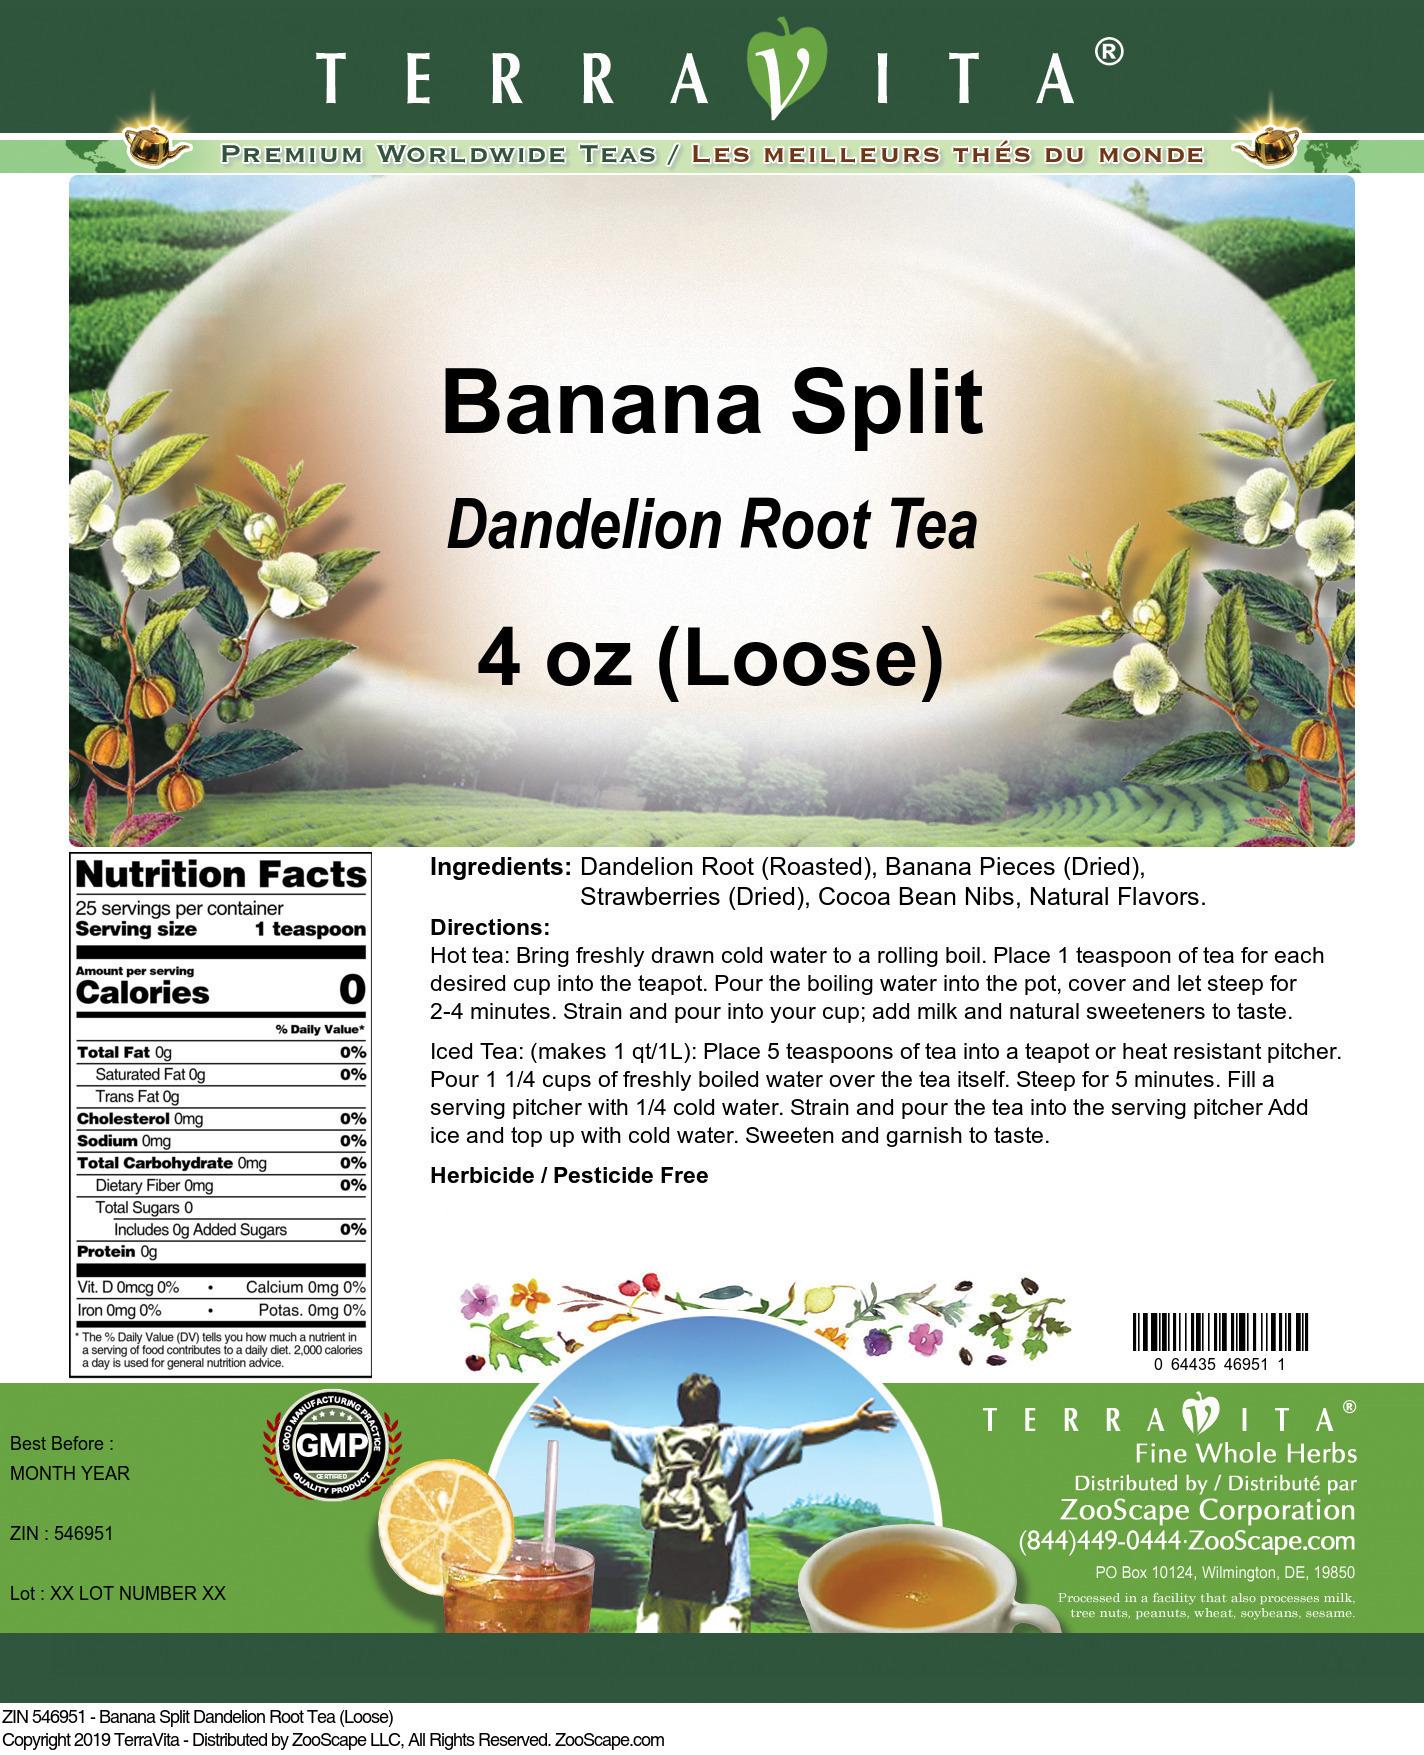 Banana Split Dandelion Root